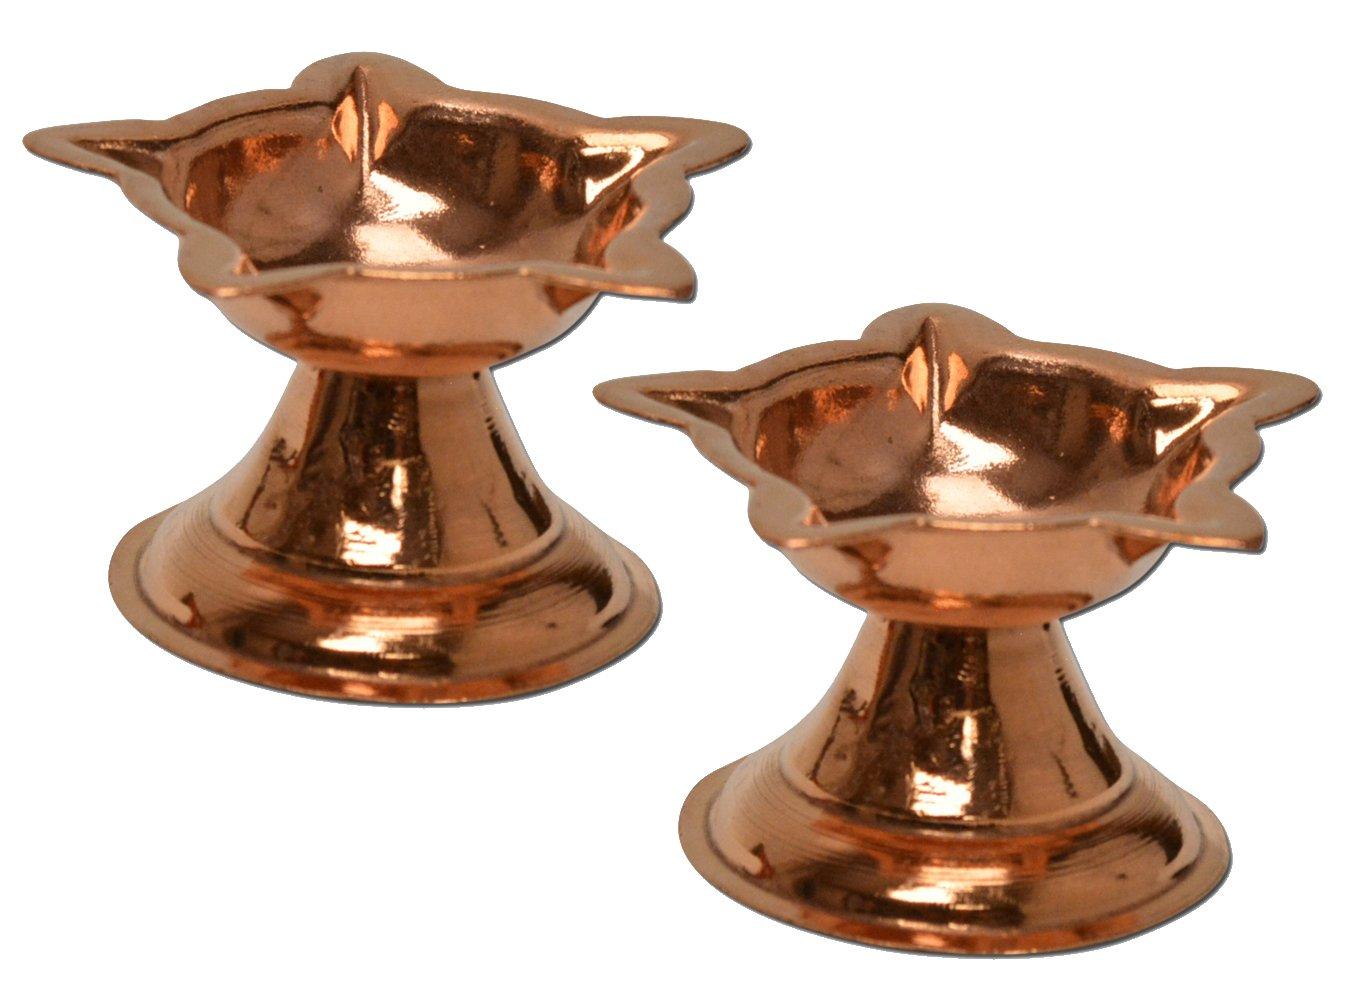 Set of 2 Copper Diyas with Five Edges, Panchmukhi Copper Diya